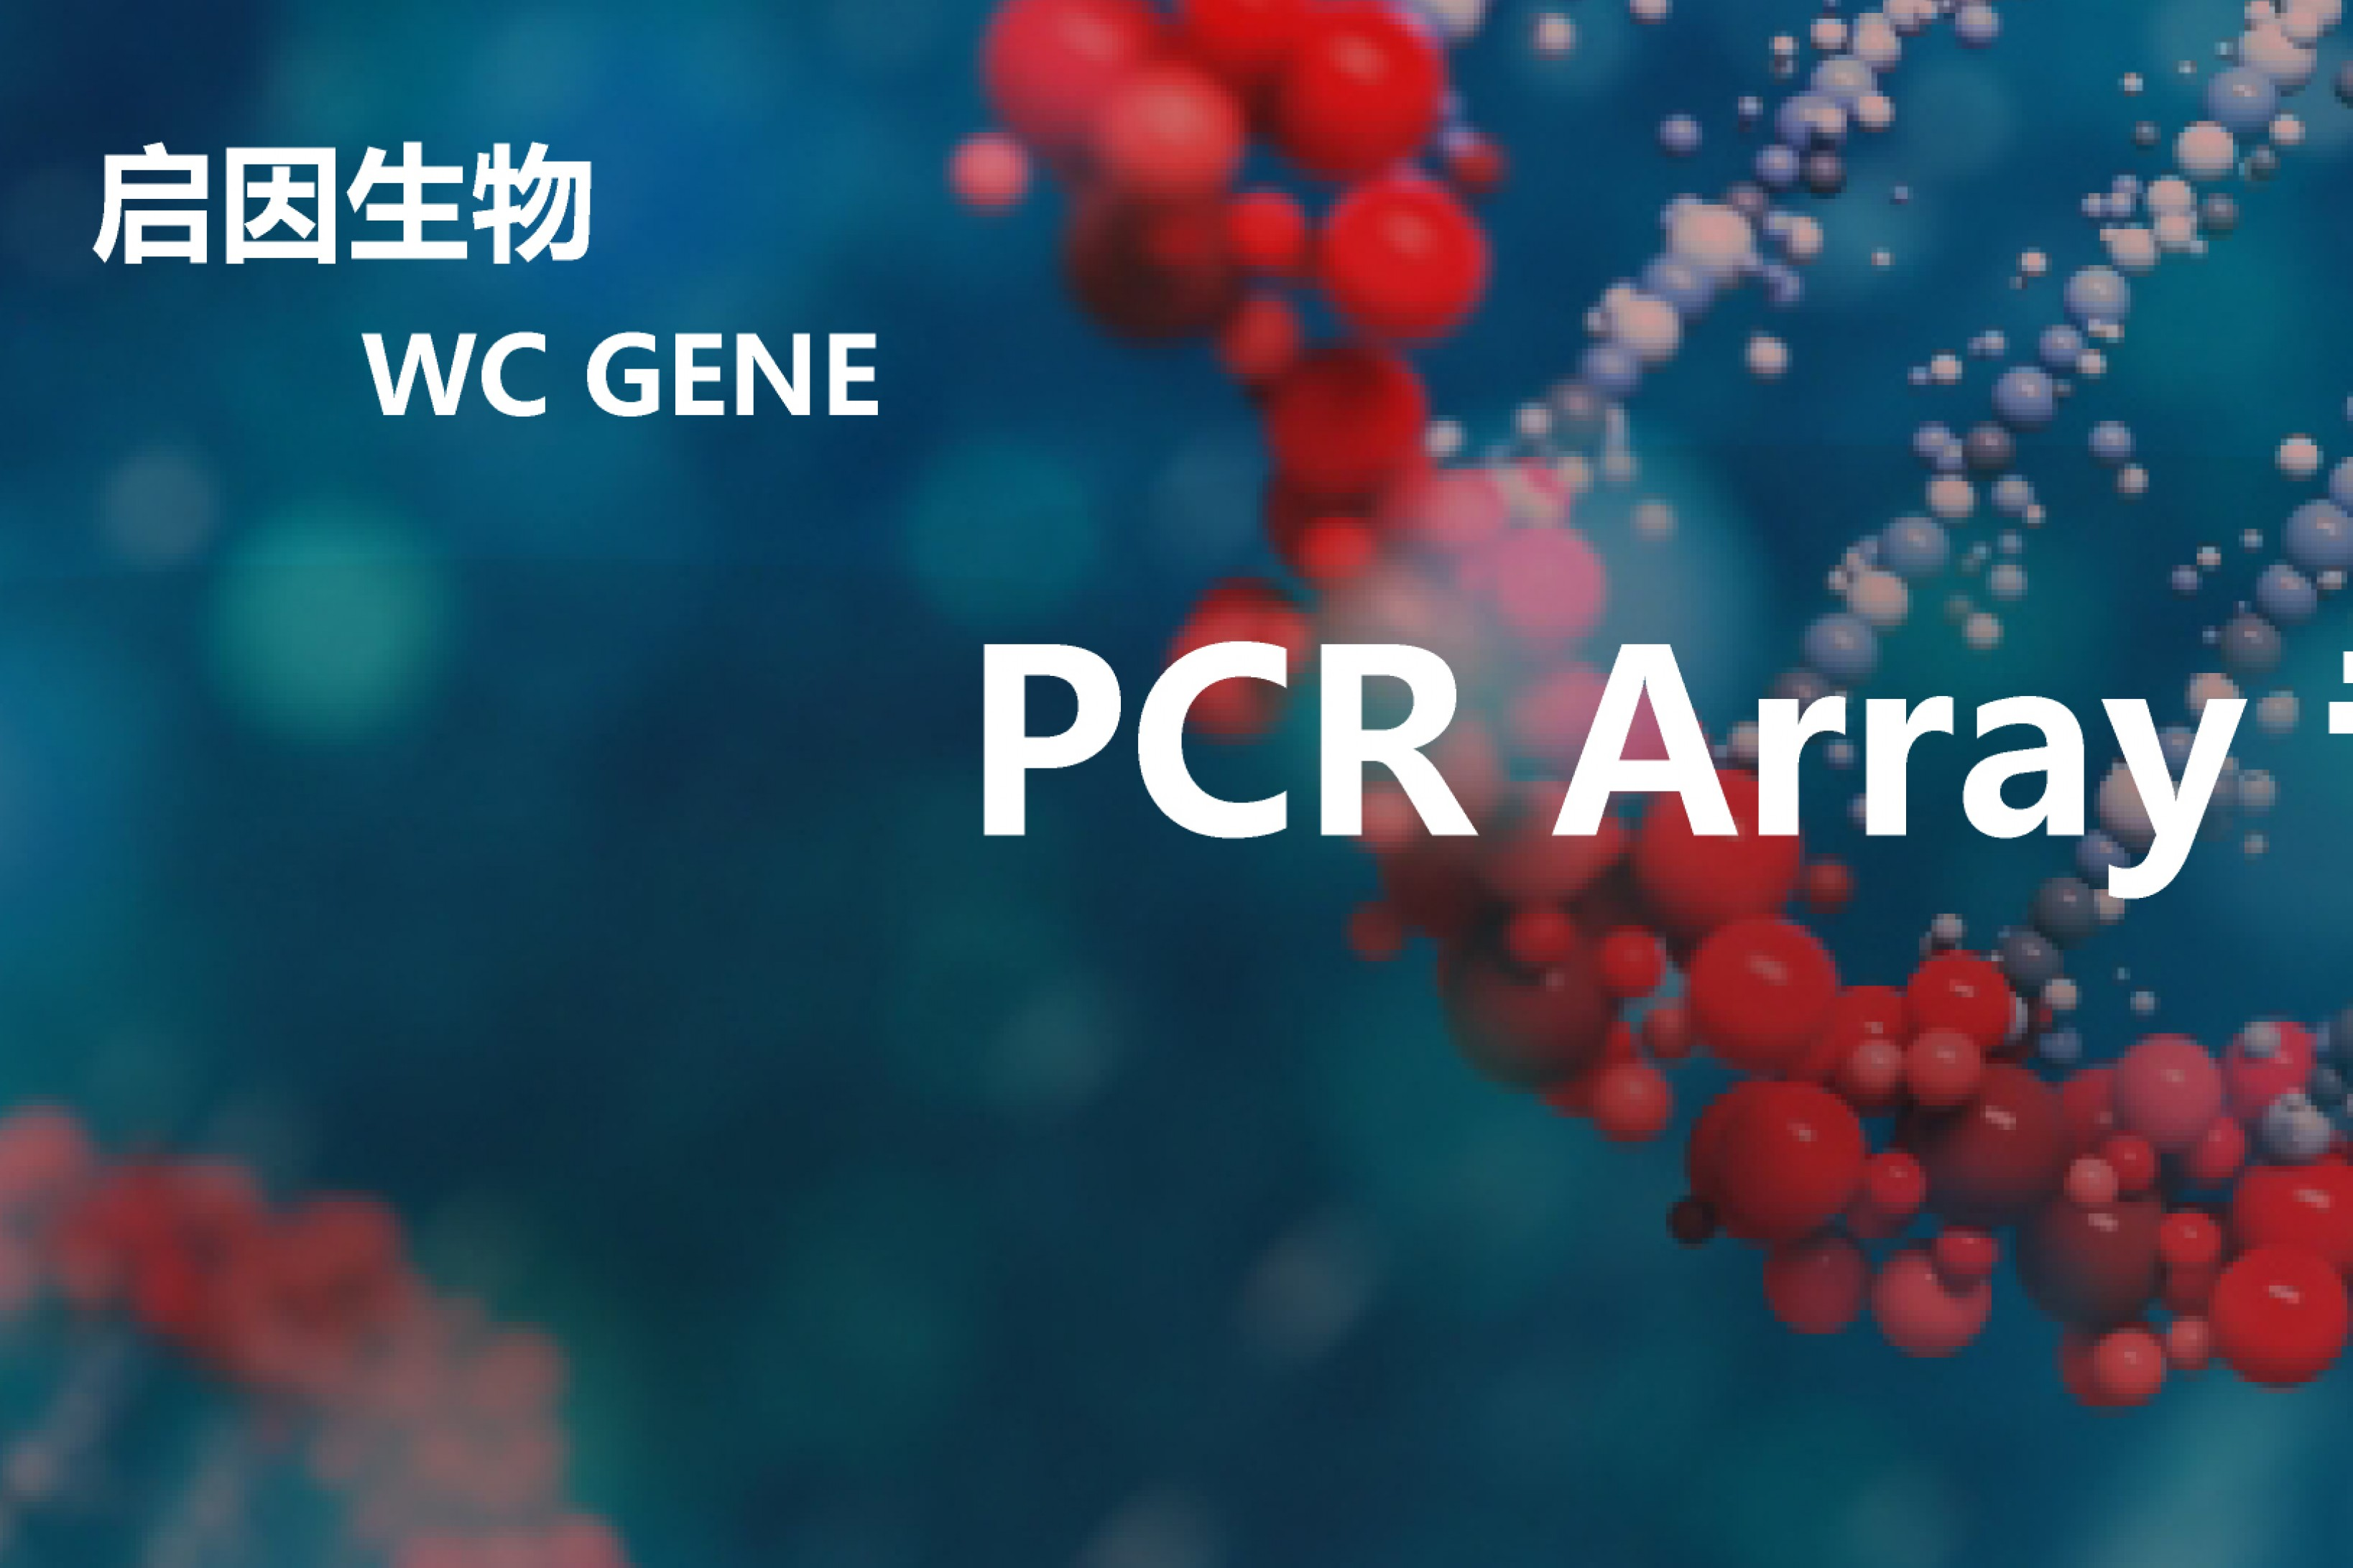 毒力因子qPCR檢測 virulence factors qPCR array